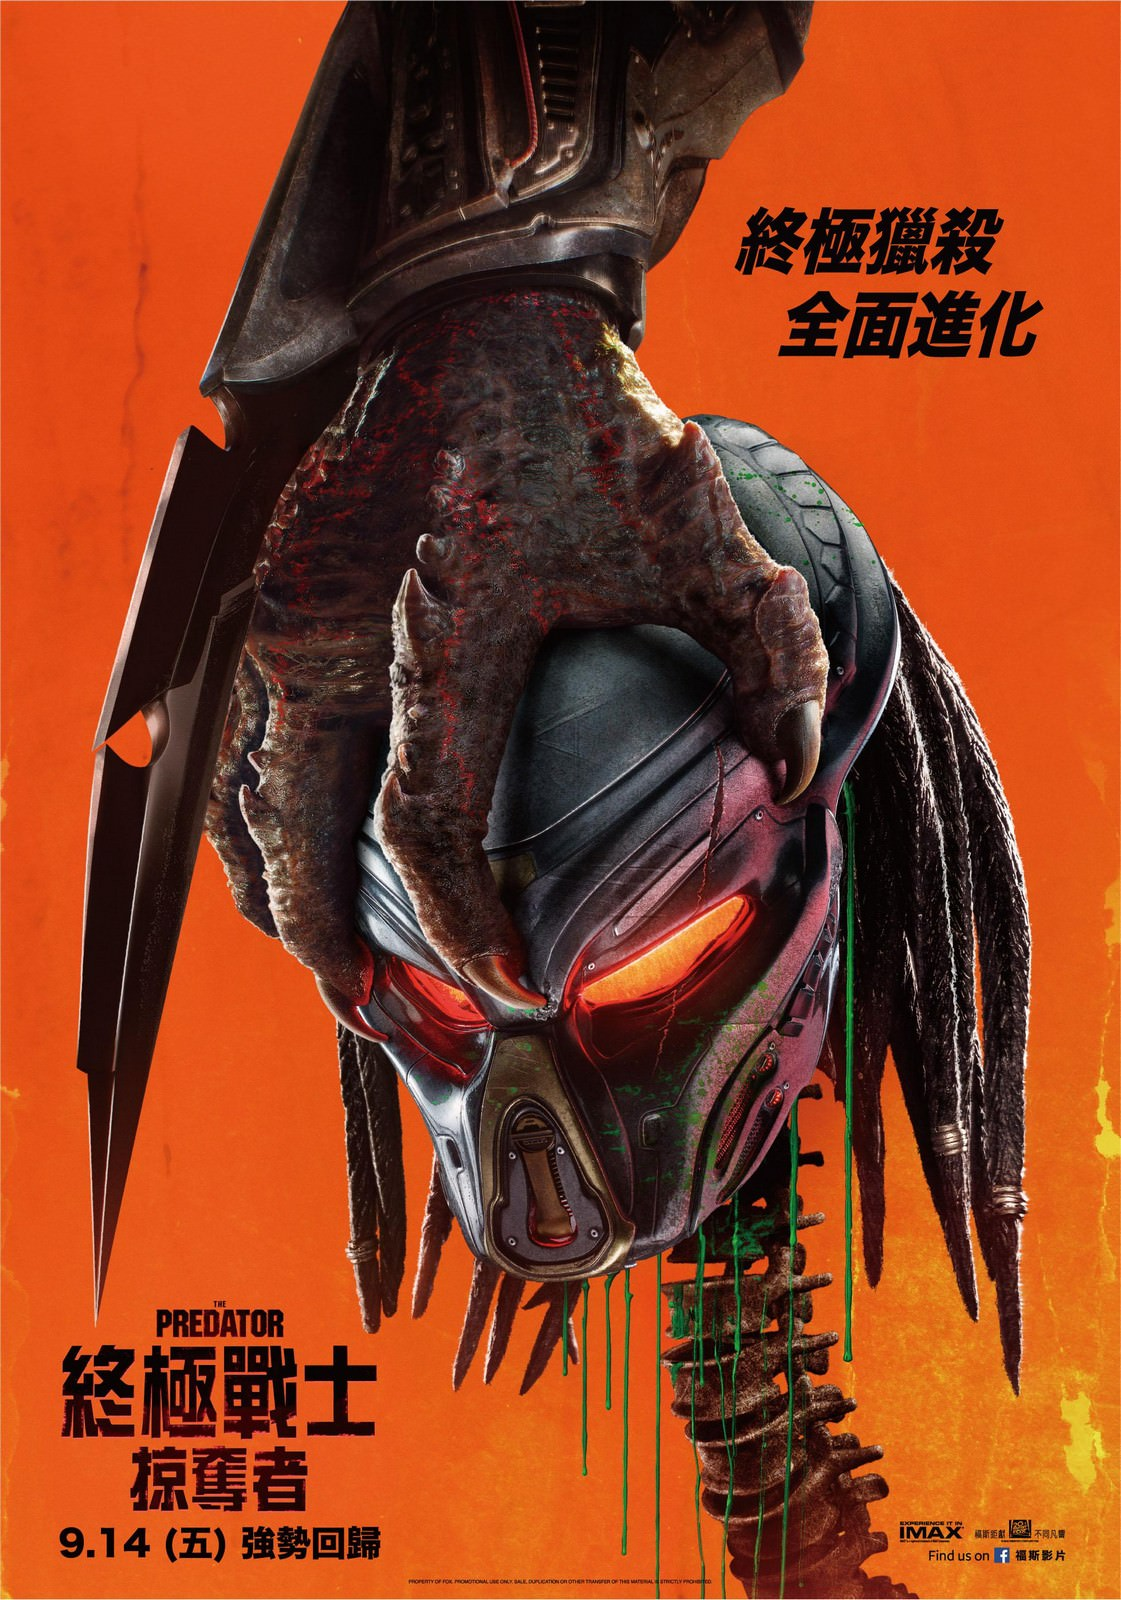 Movie, The Predator(美國, 2018) / 終極戰士:掠奪者(台) / 铁血战士(中) / 鐵血戰士:血獸進化(港), 電影海報, 台灣